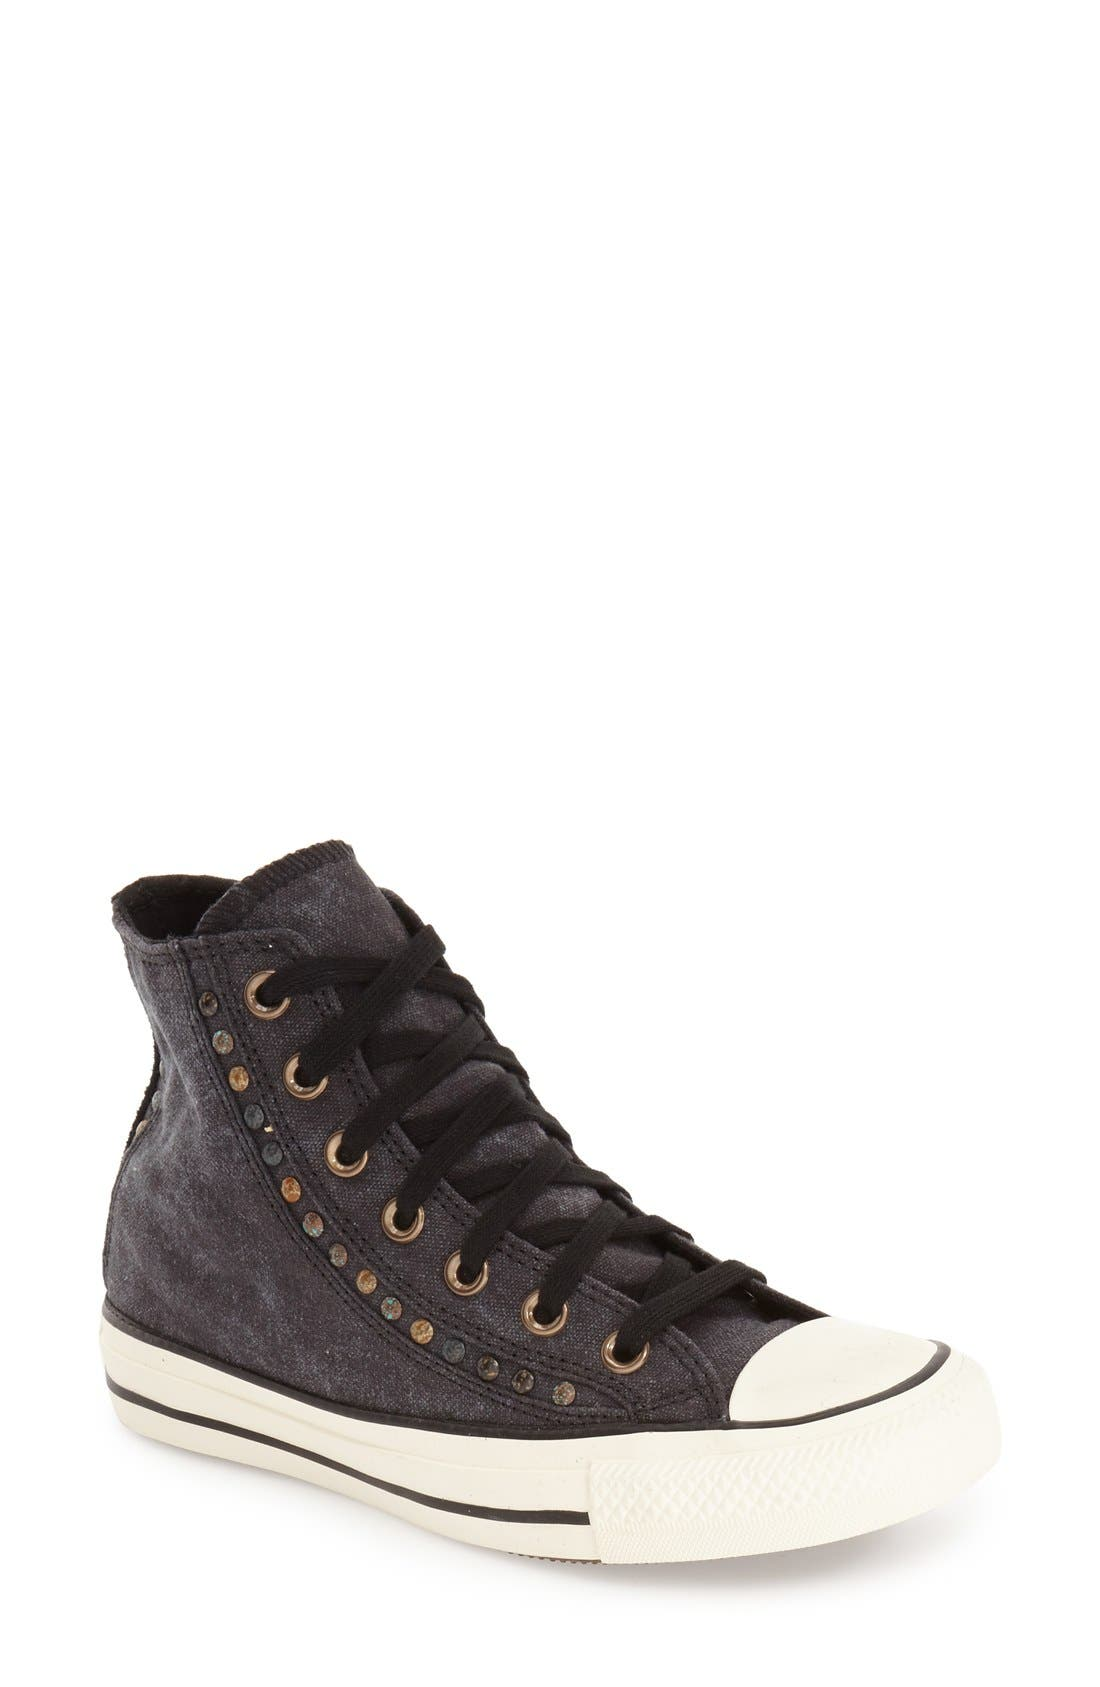 Main Image - Converse Chuck Taylor® All Star® 'Eyerow' Studded High Top Sneaker (Women)